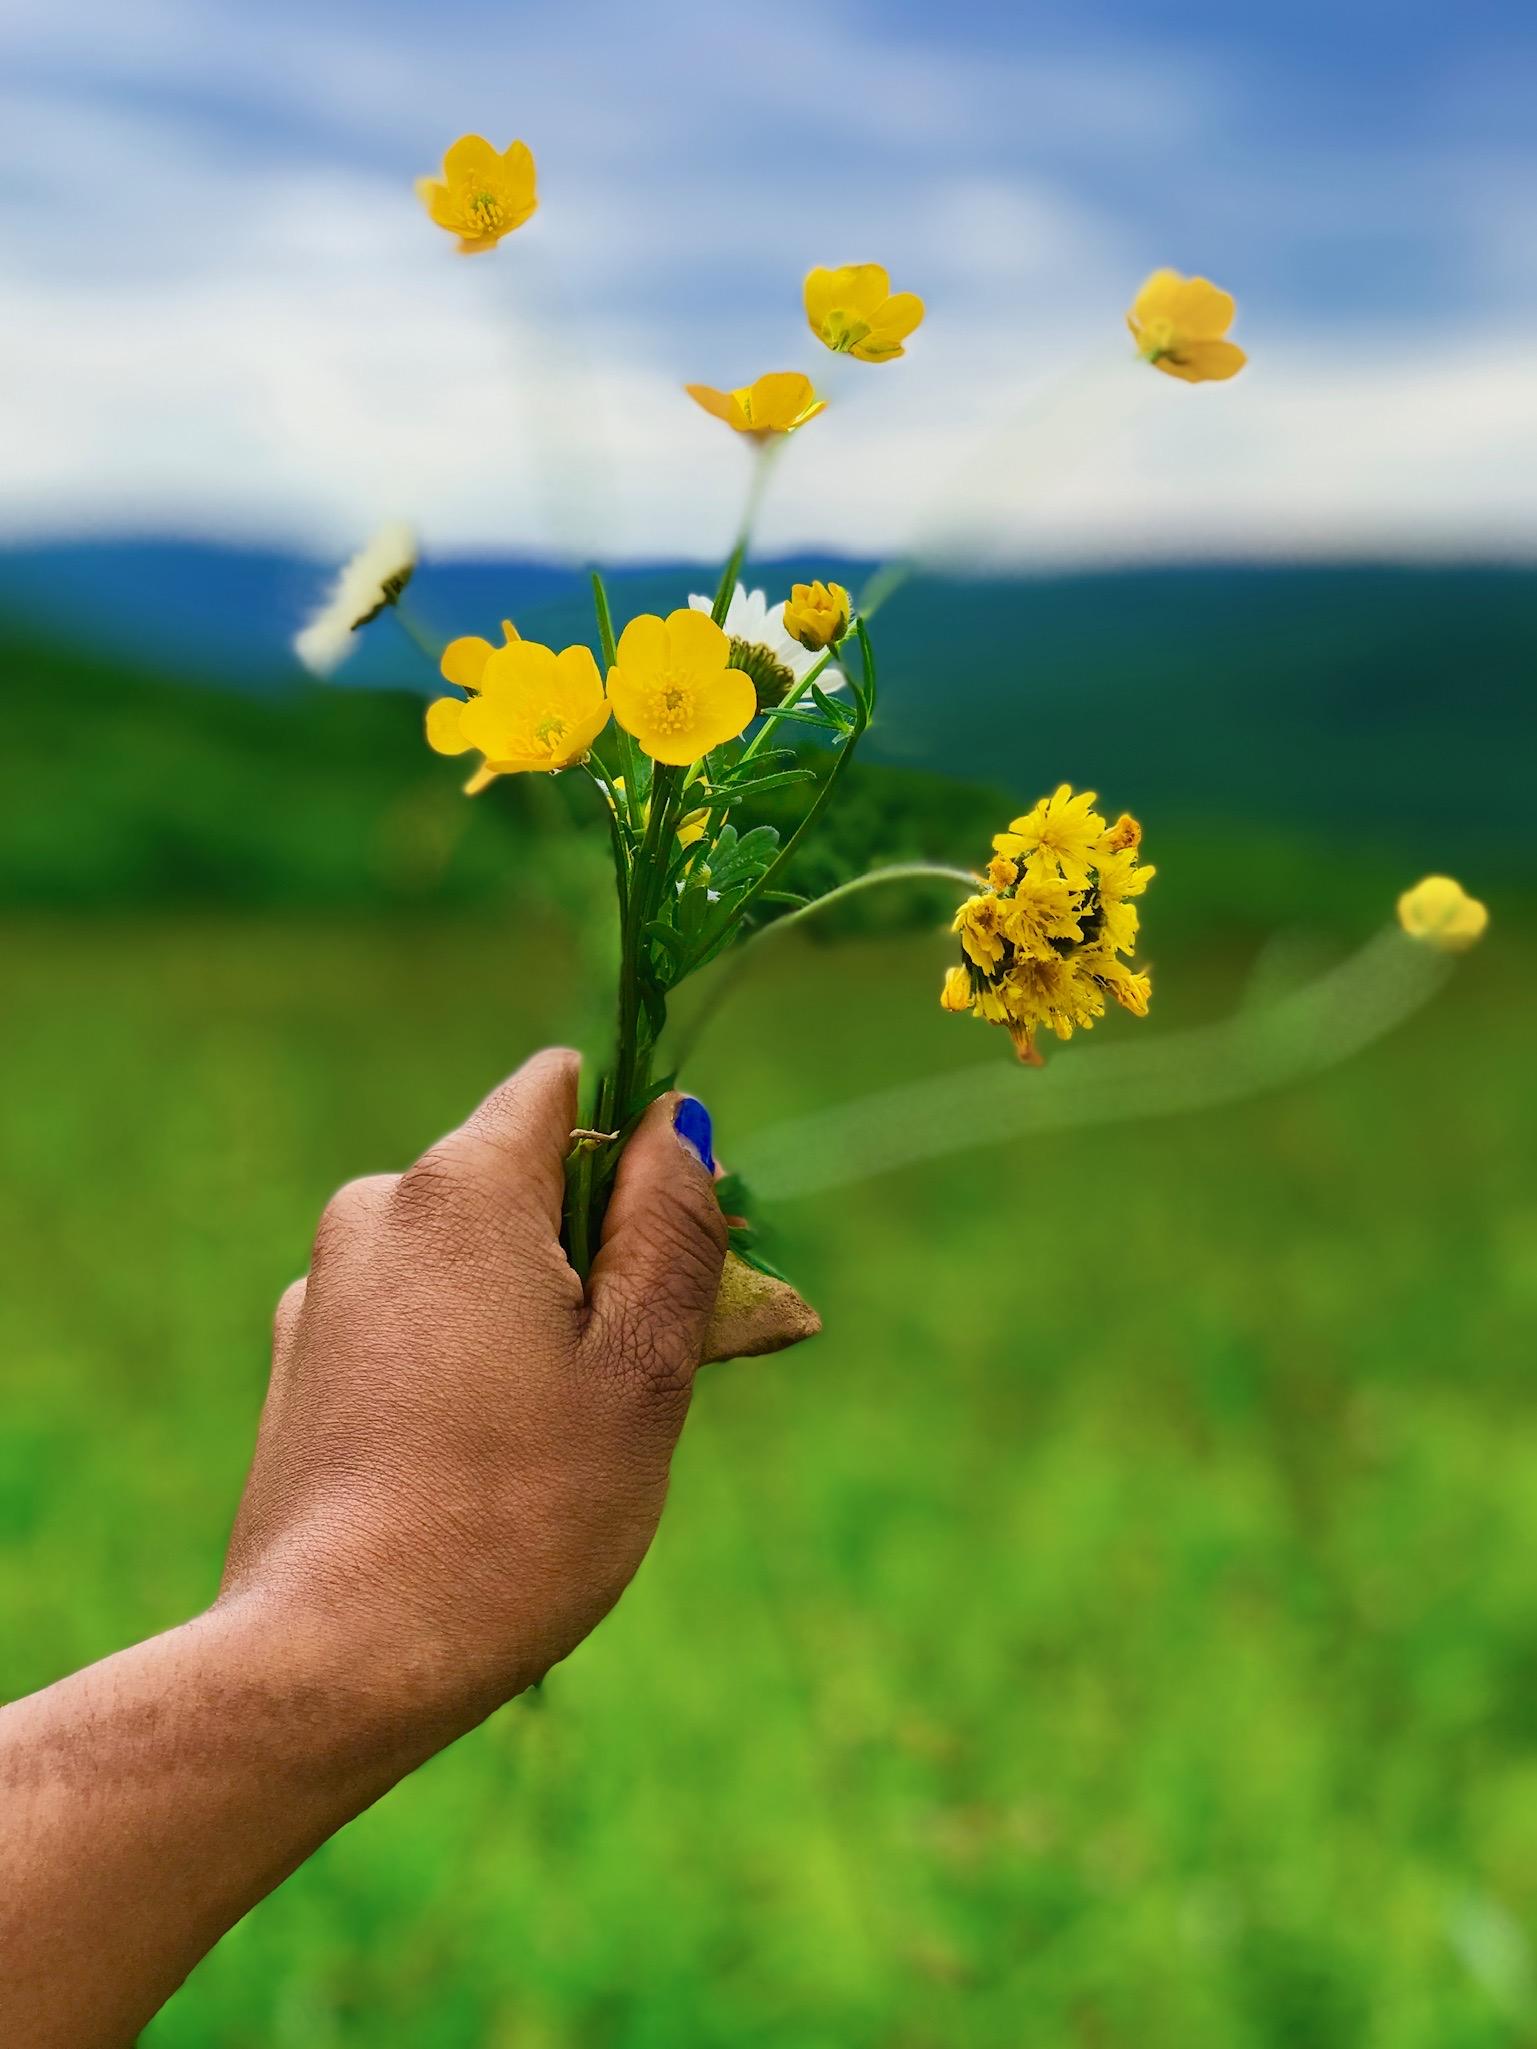 Hand holding yellow flowers